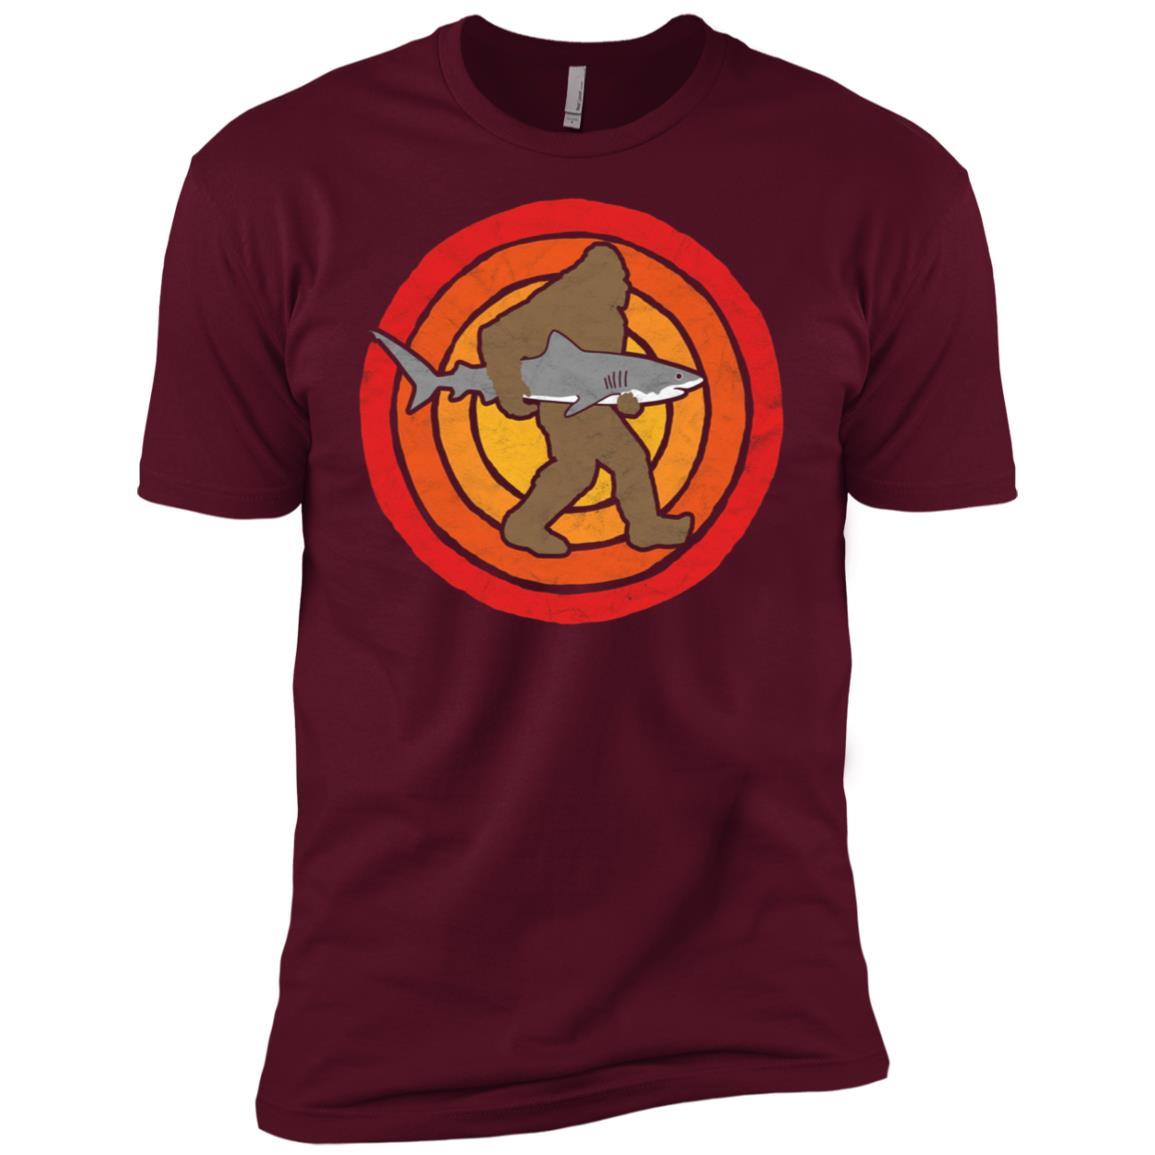 Bigfoot Silhouette & Great White Shark Sun-2 Men Short Sleeve T-Shirt